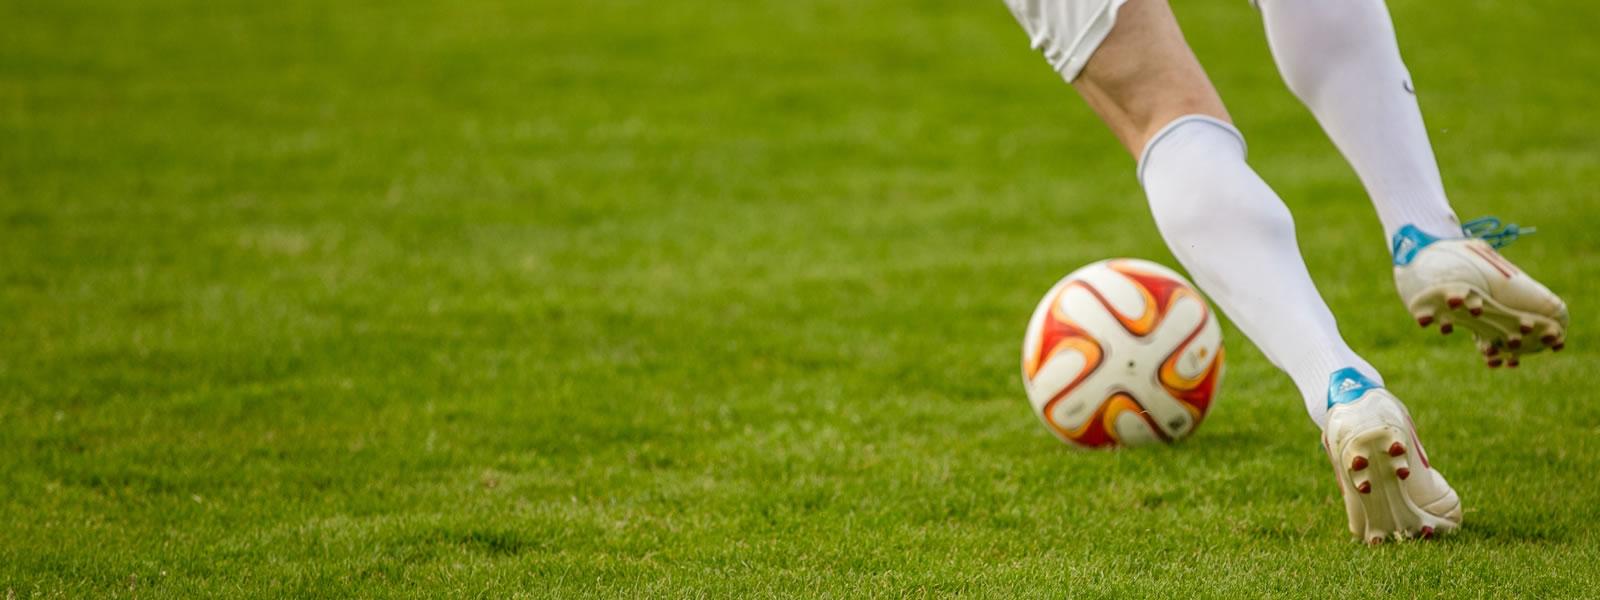 preWeb Design - Football player with ball